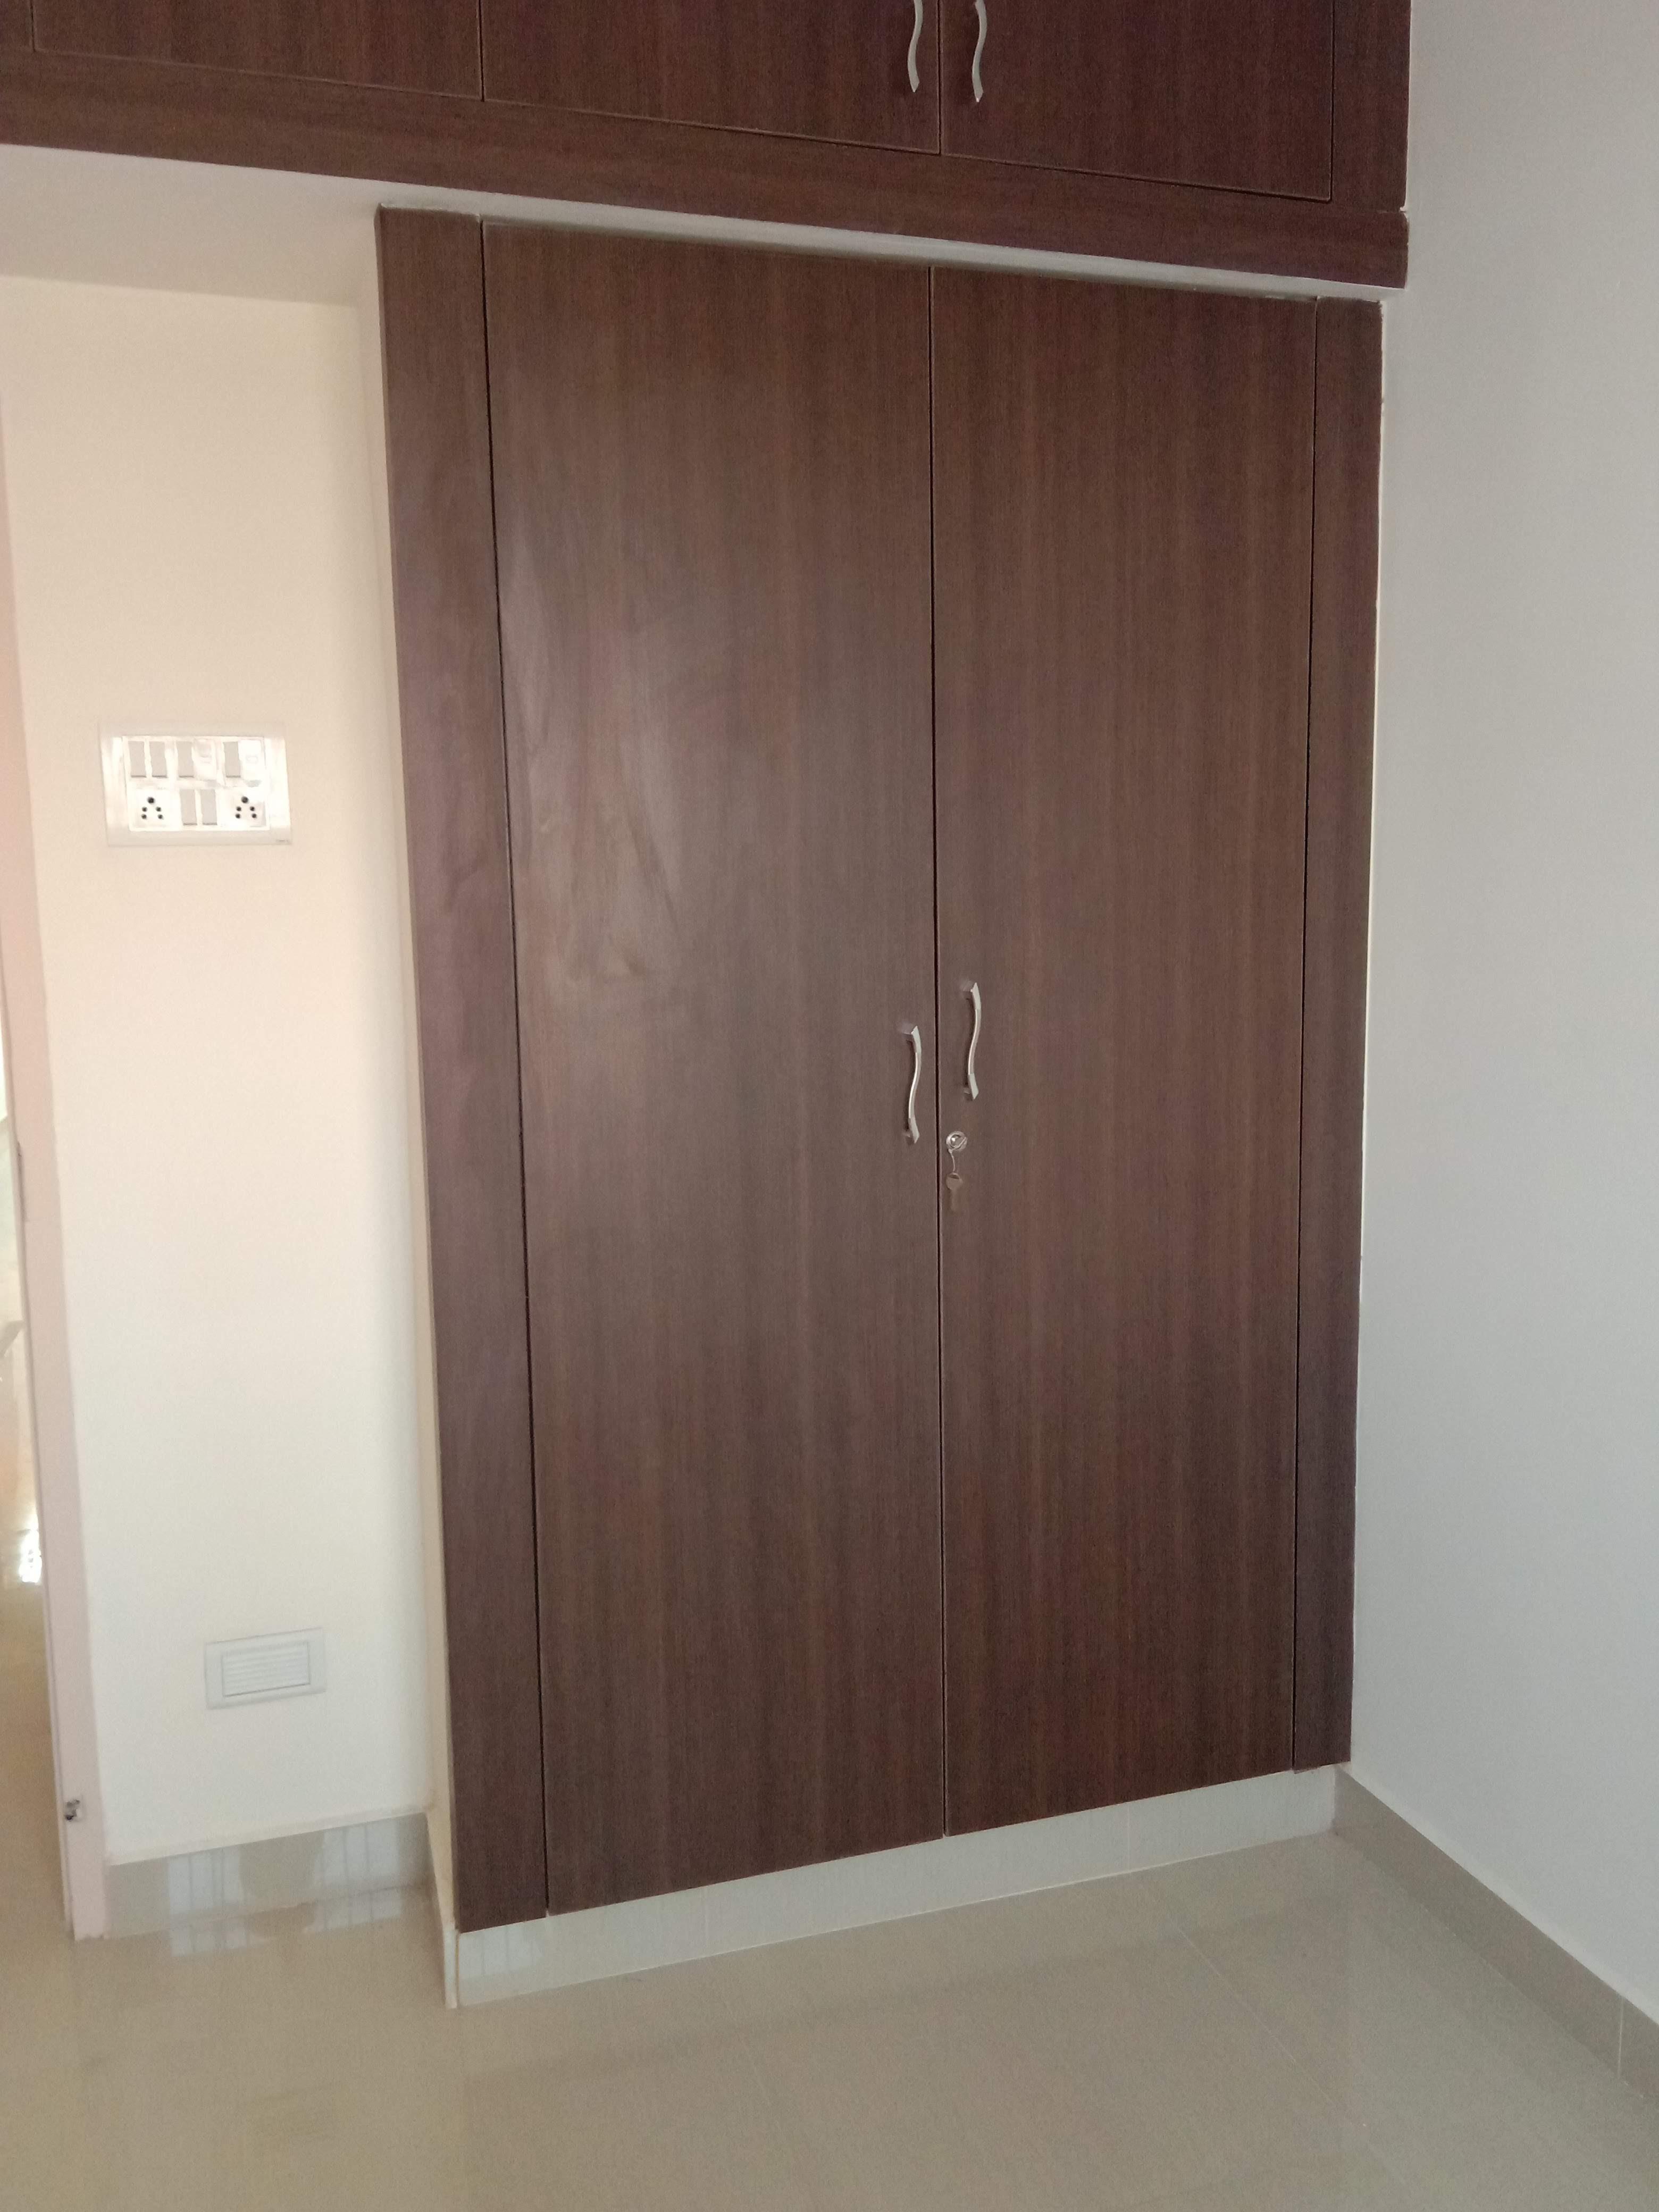 KAATUPAKKAM - LIVING ROOM (3)